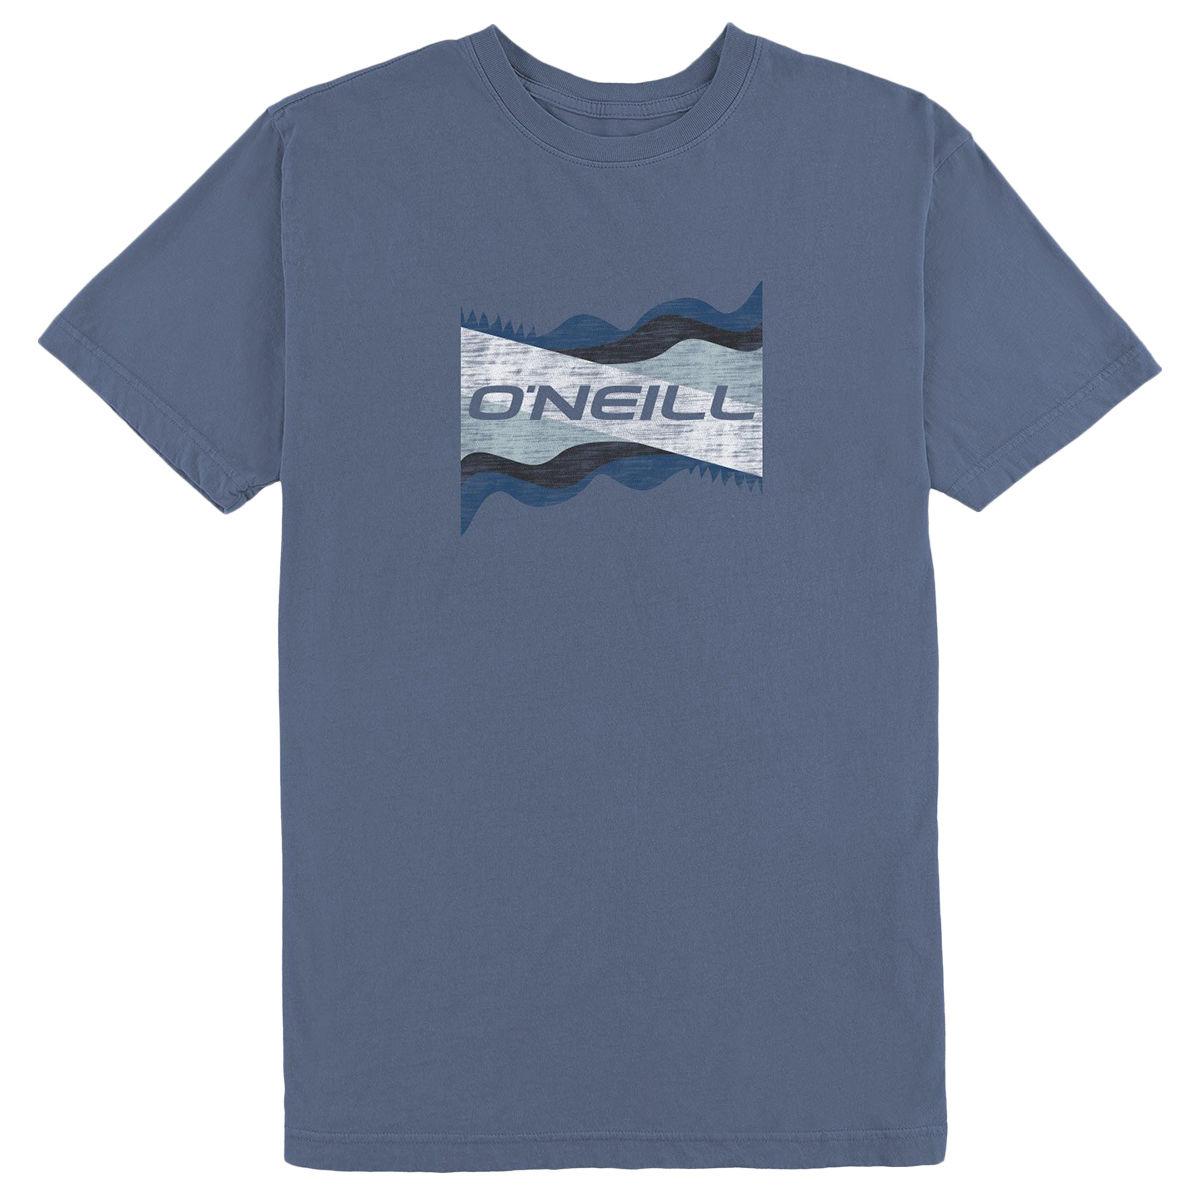 O'neill Men's Liquid Dream  Short-Sleeve Tee - Blue, L